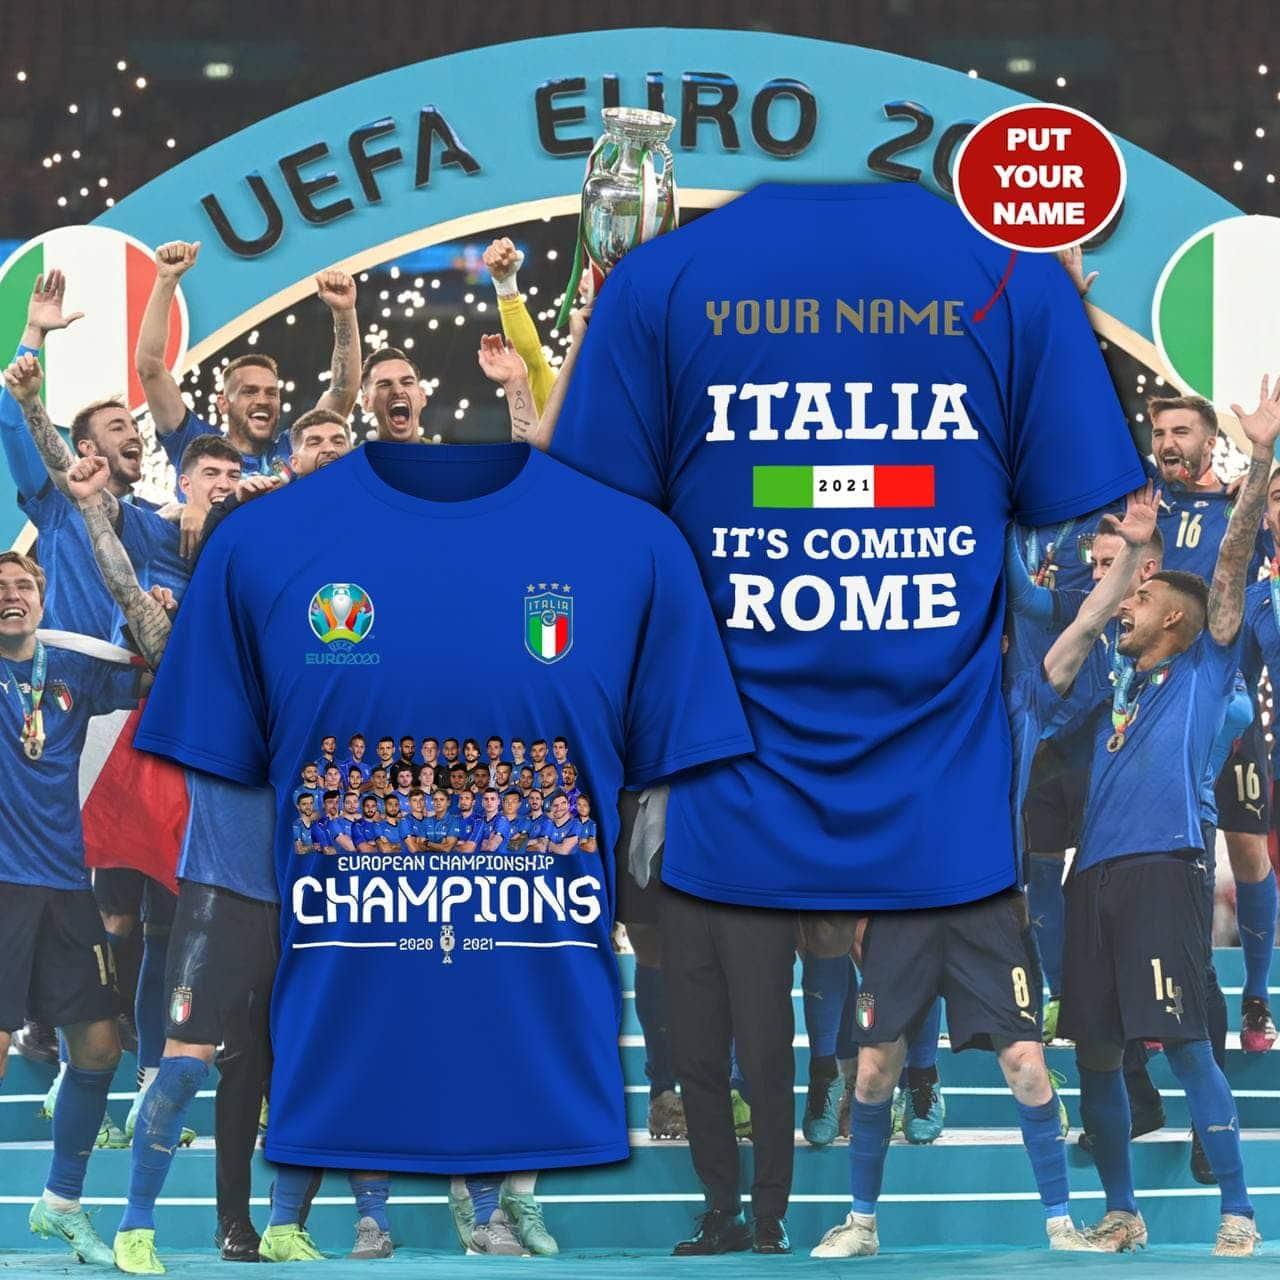 24 European Champions 2020 2021 Italia Its Come Rome T Shirt 1 1